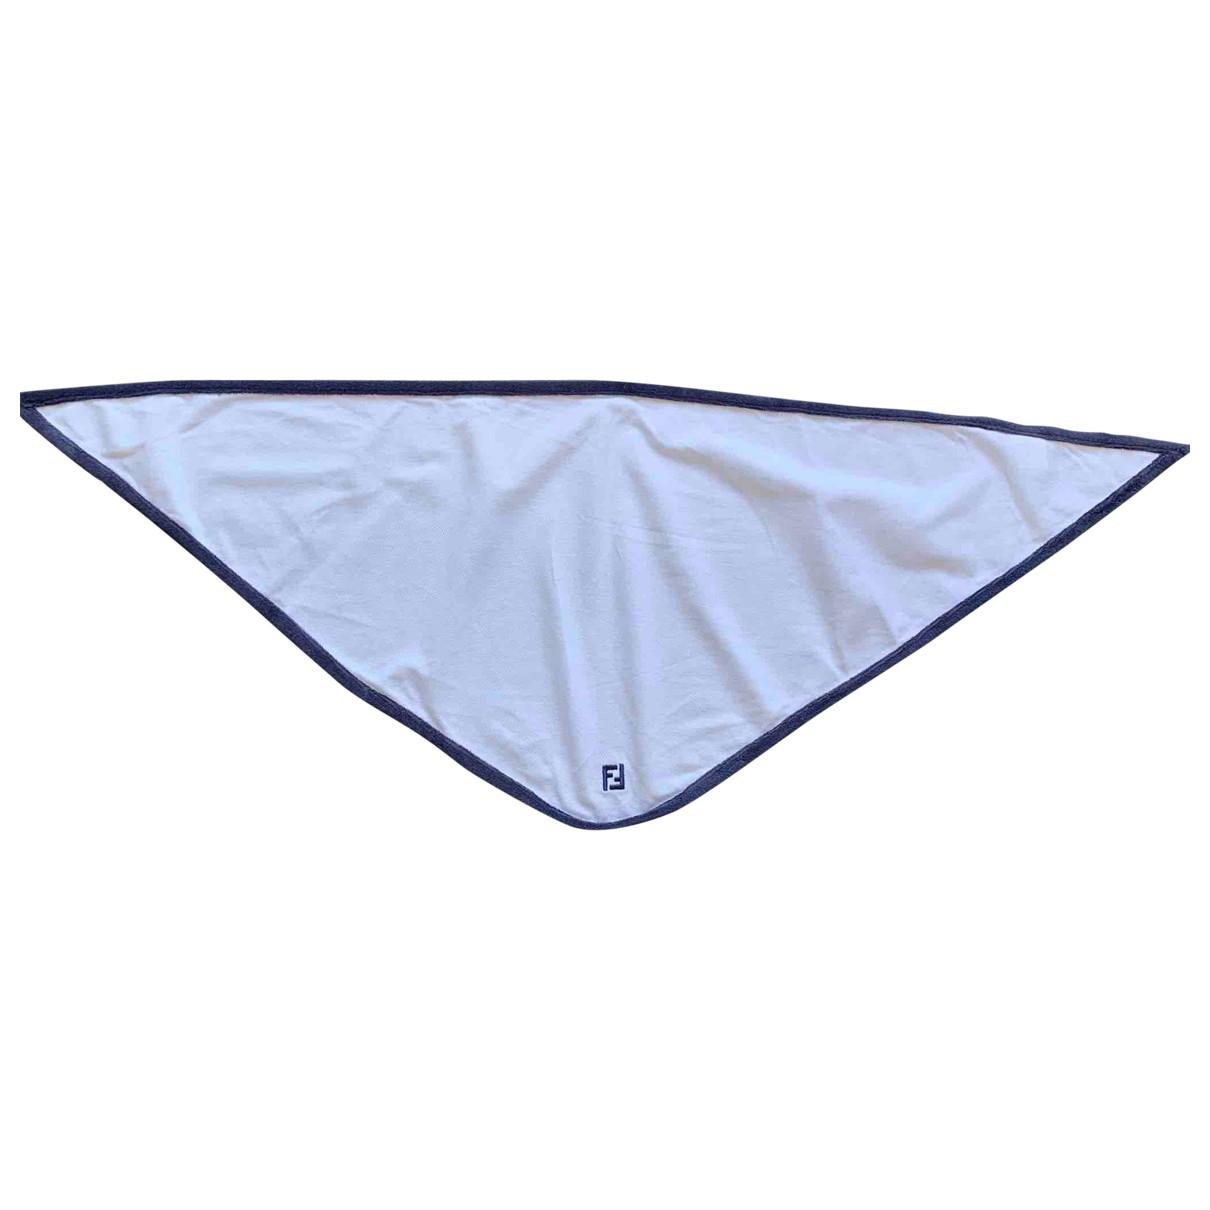 Fendi \N White Cotton scarf for Women \N